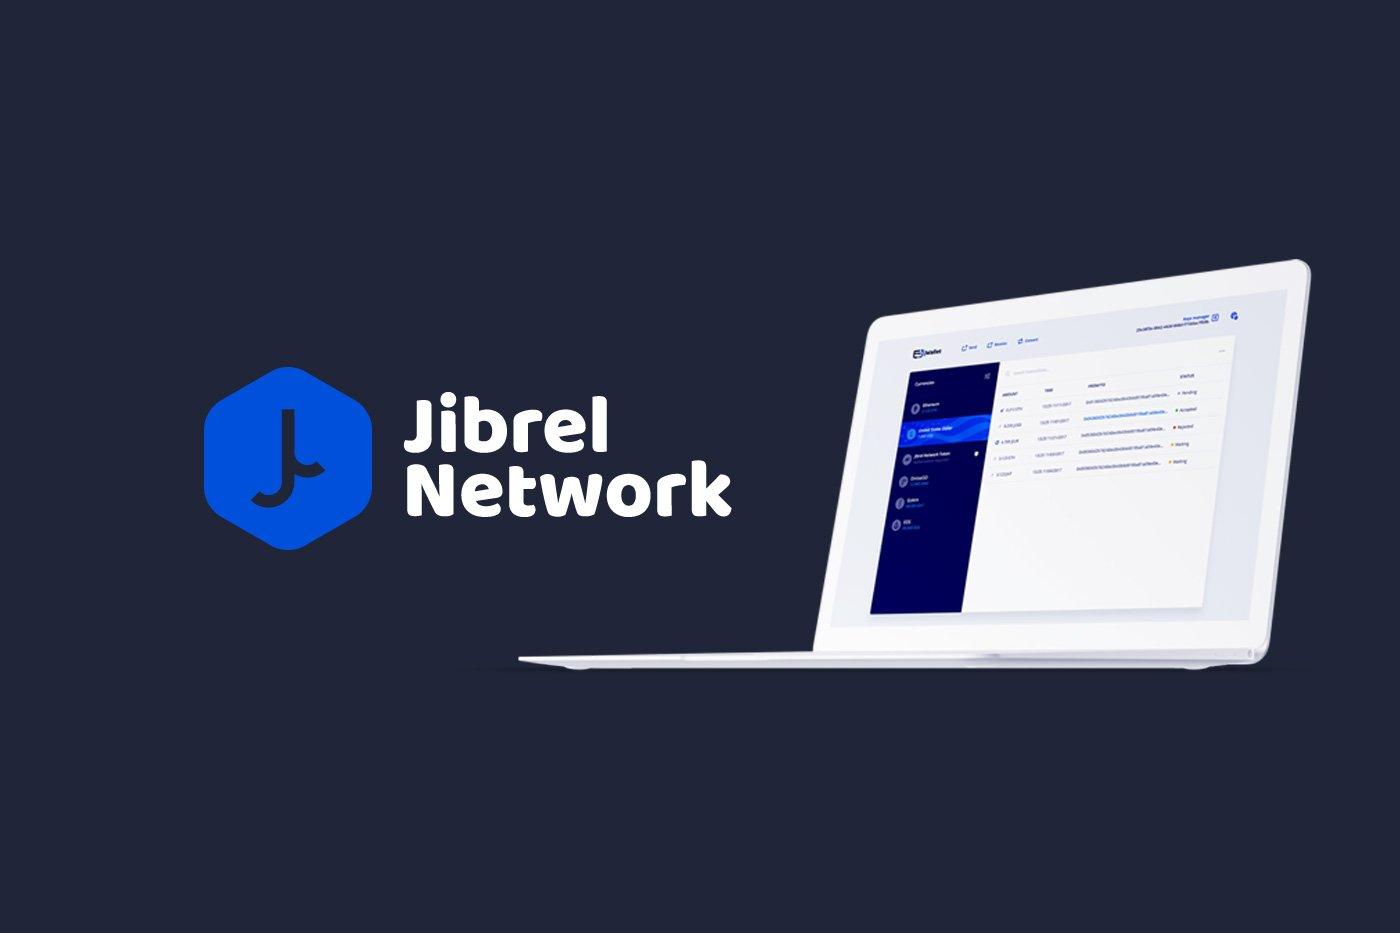 Jibrel Network Guide